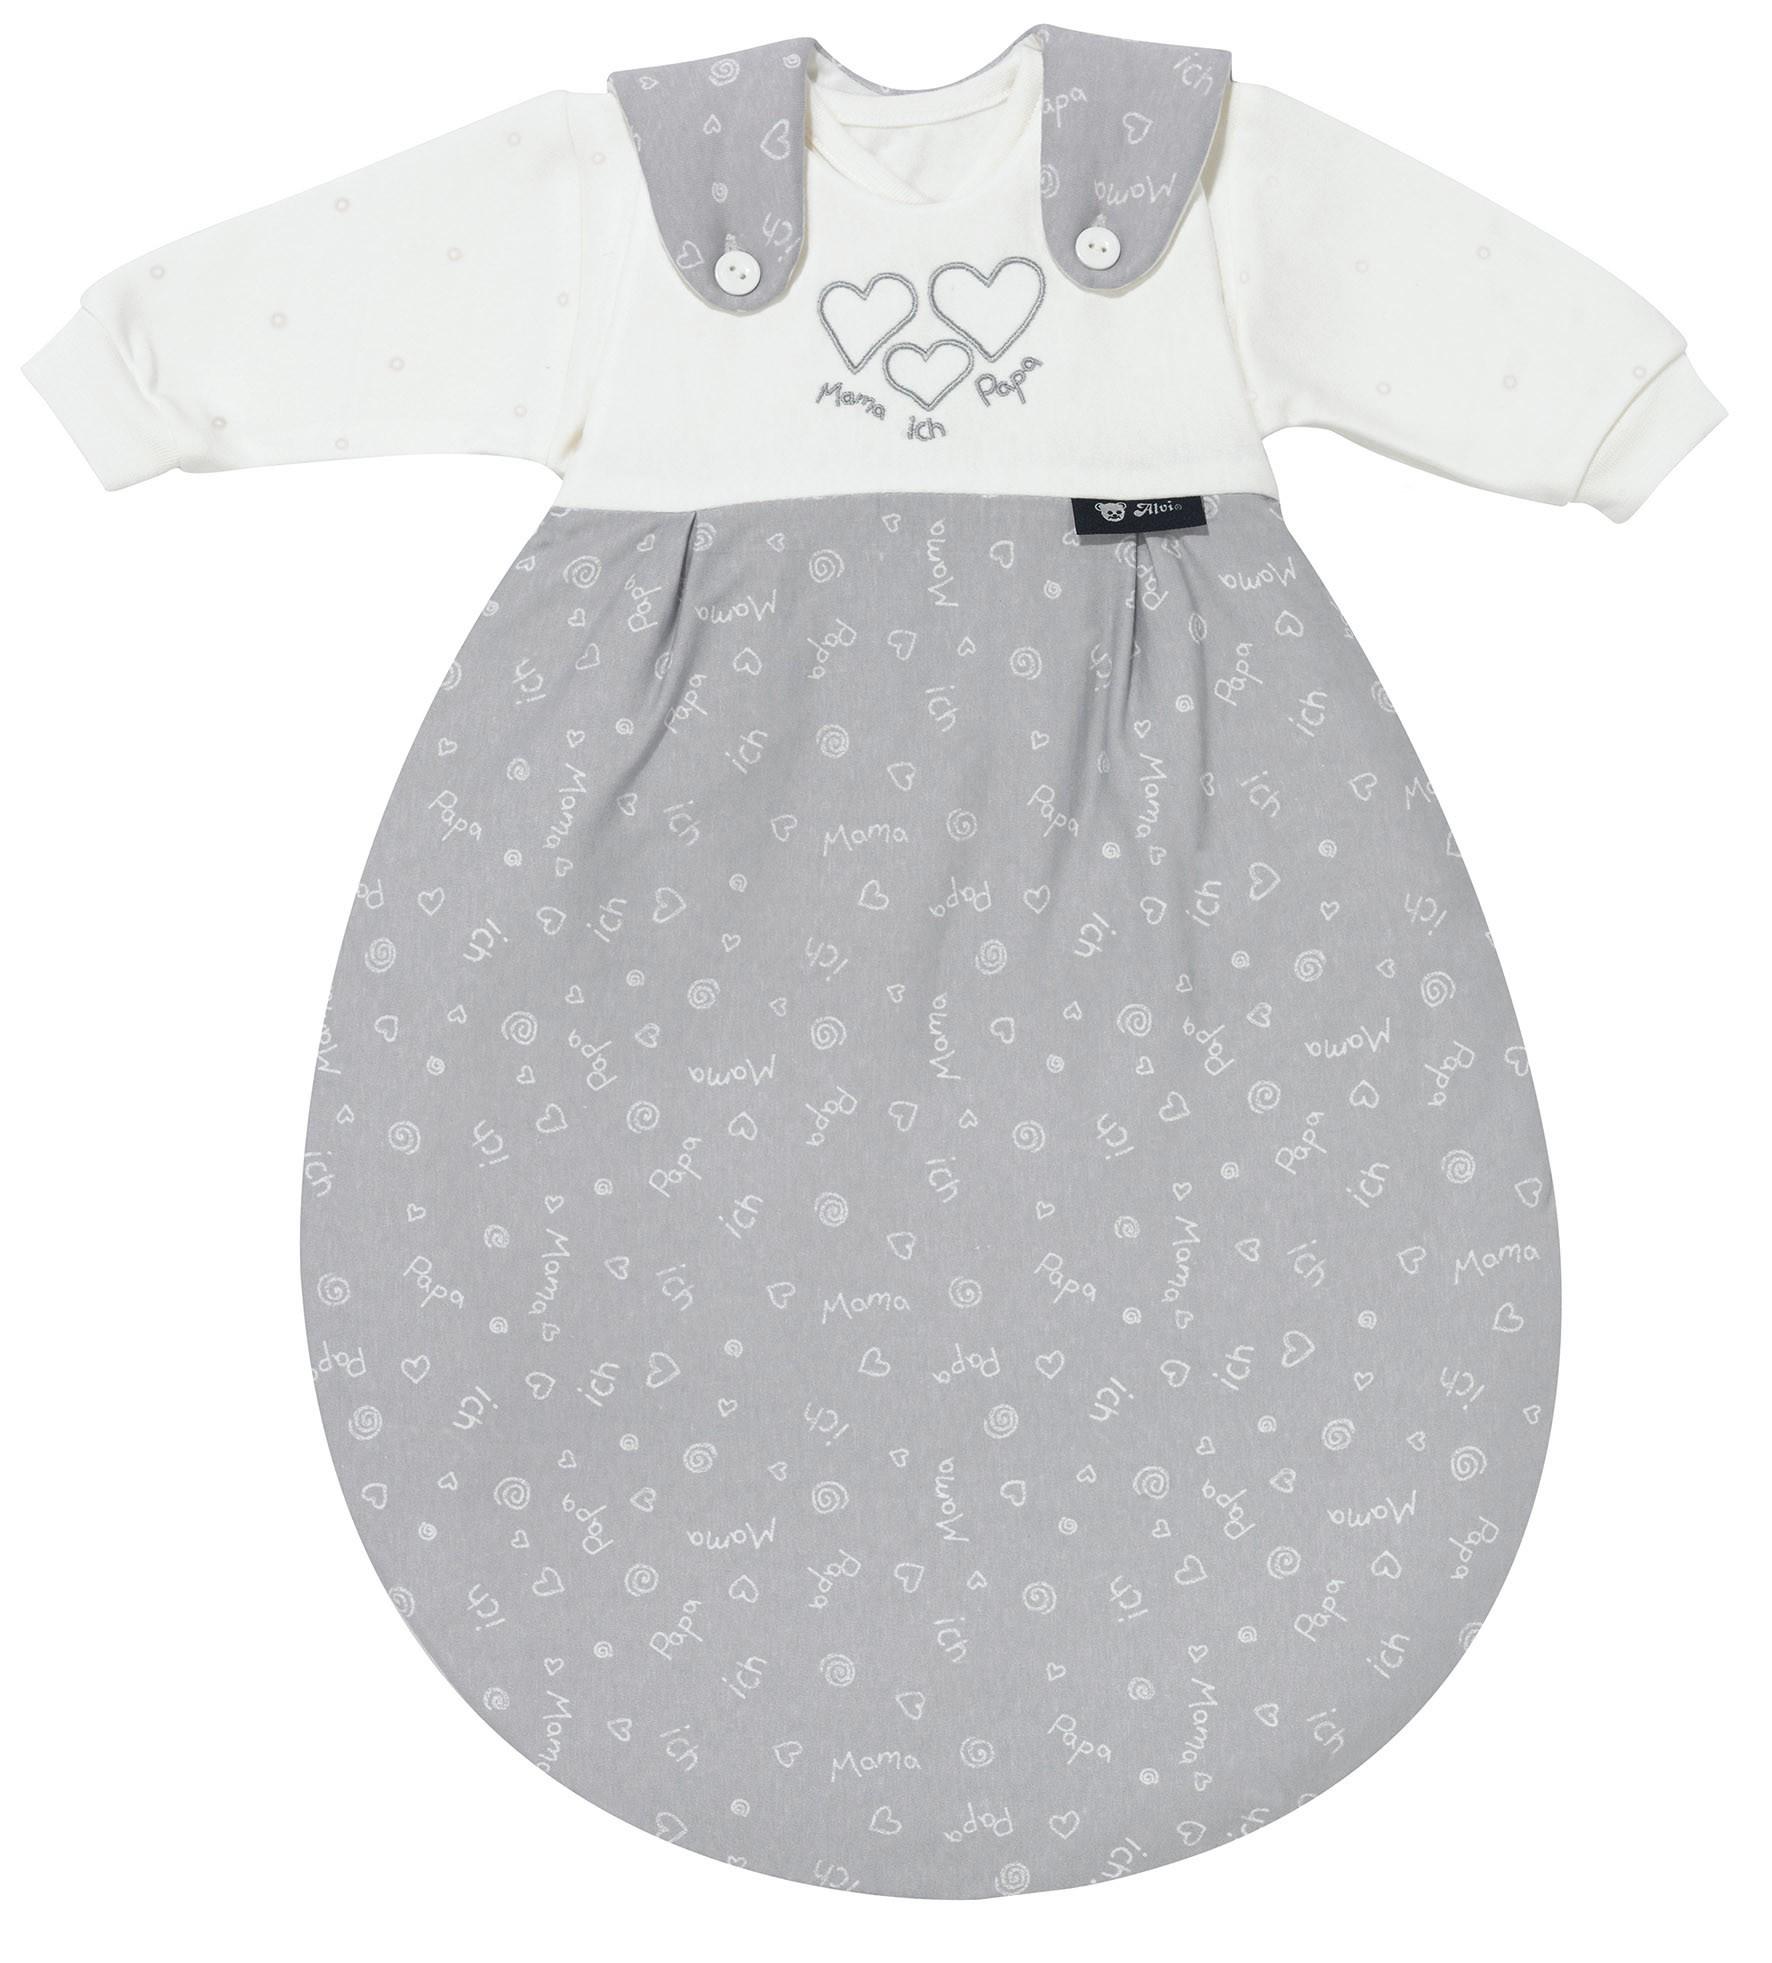 Alvi Baby Mäxchen Super-Soft 592-9 Mama-Papa-ich grau